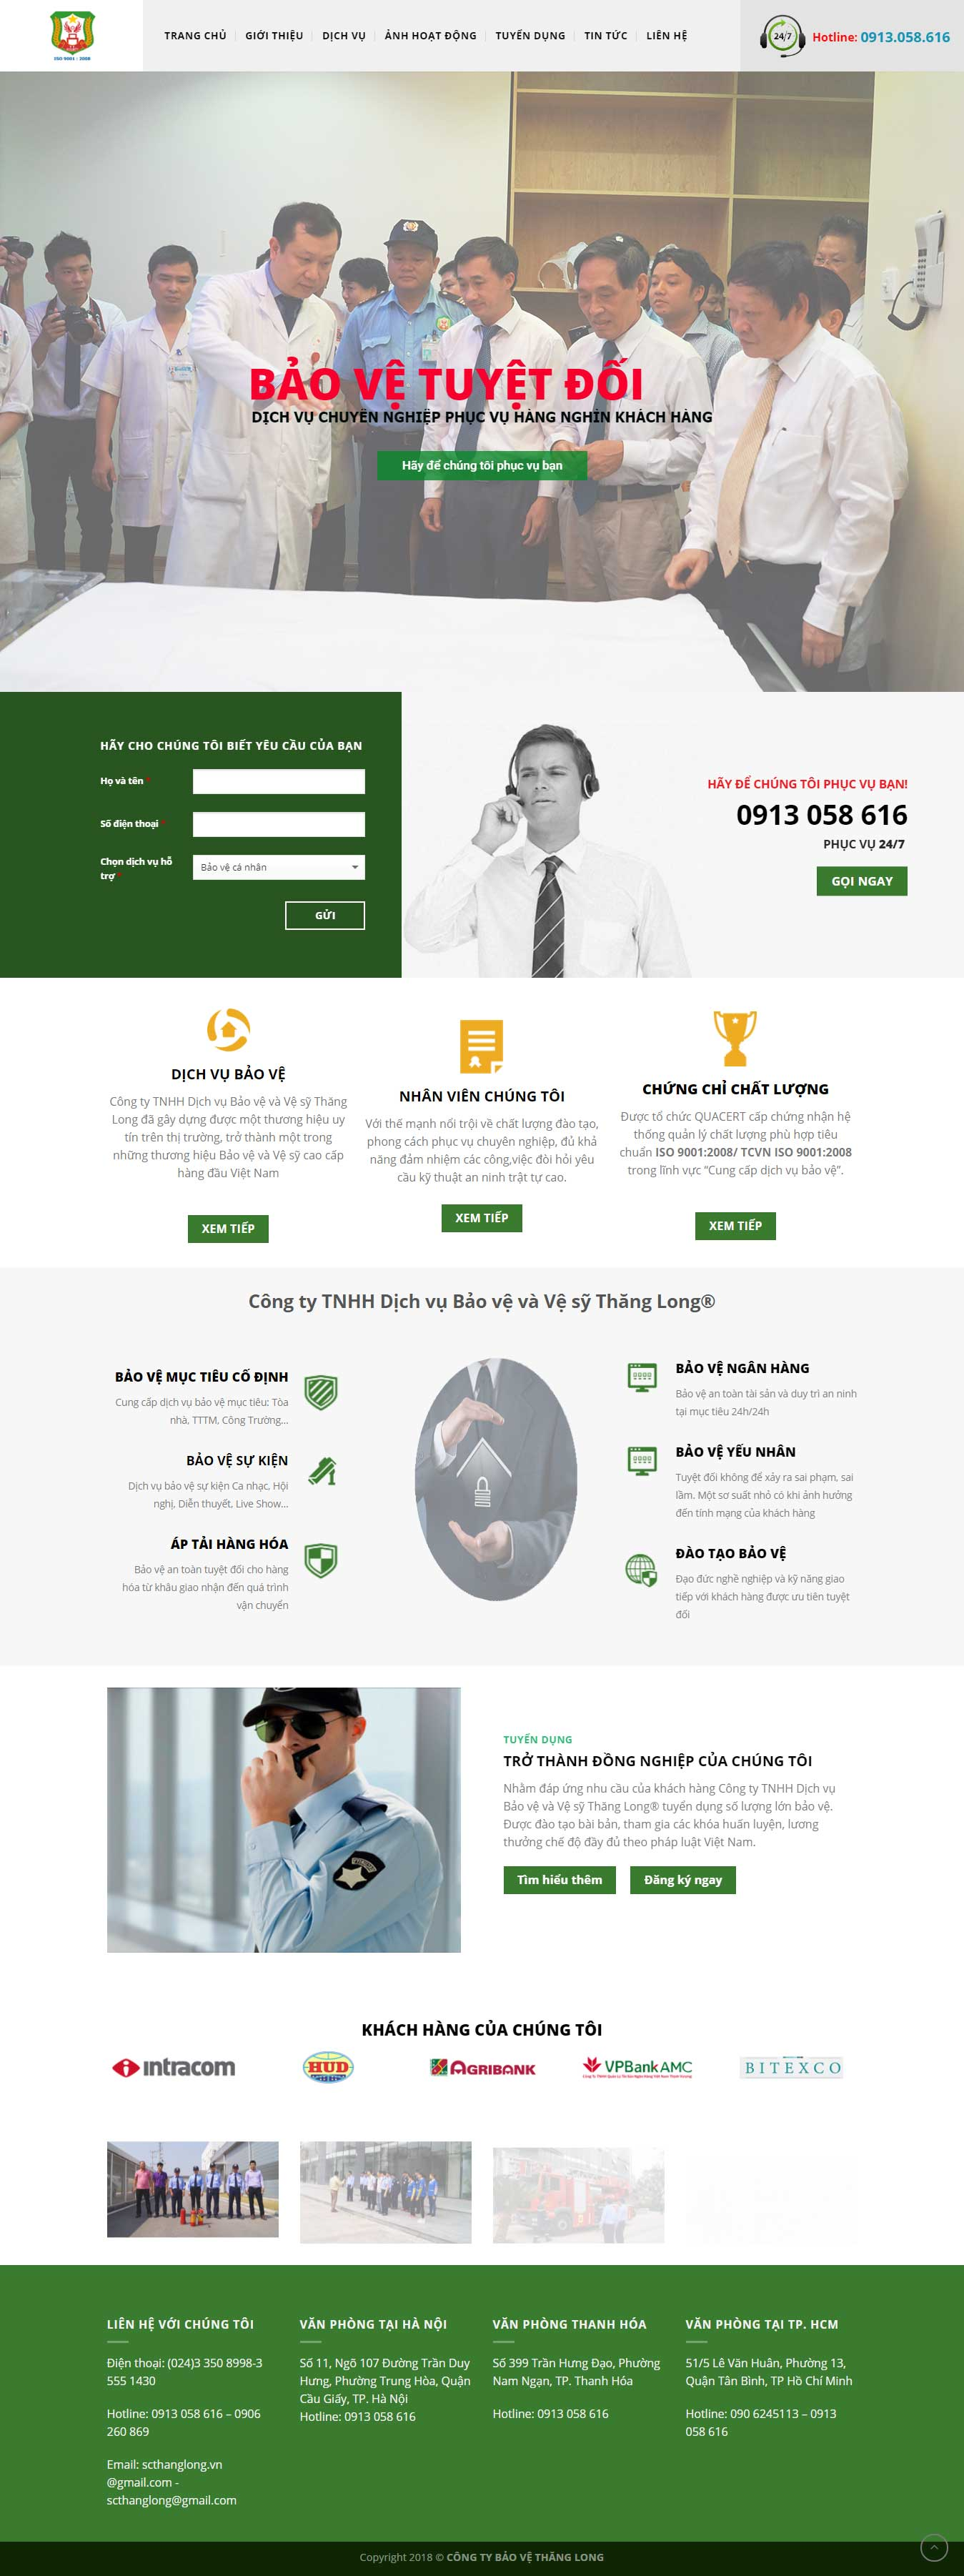 Mẫu website vệ sỹ